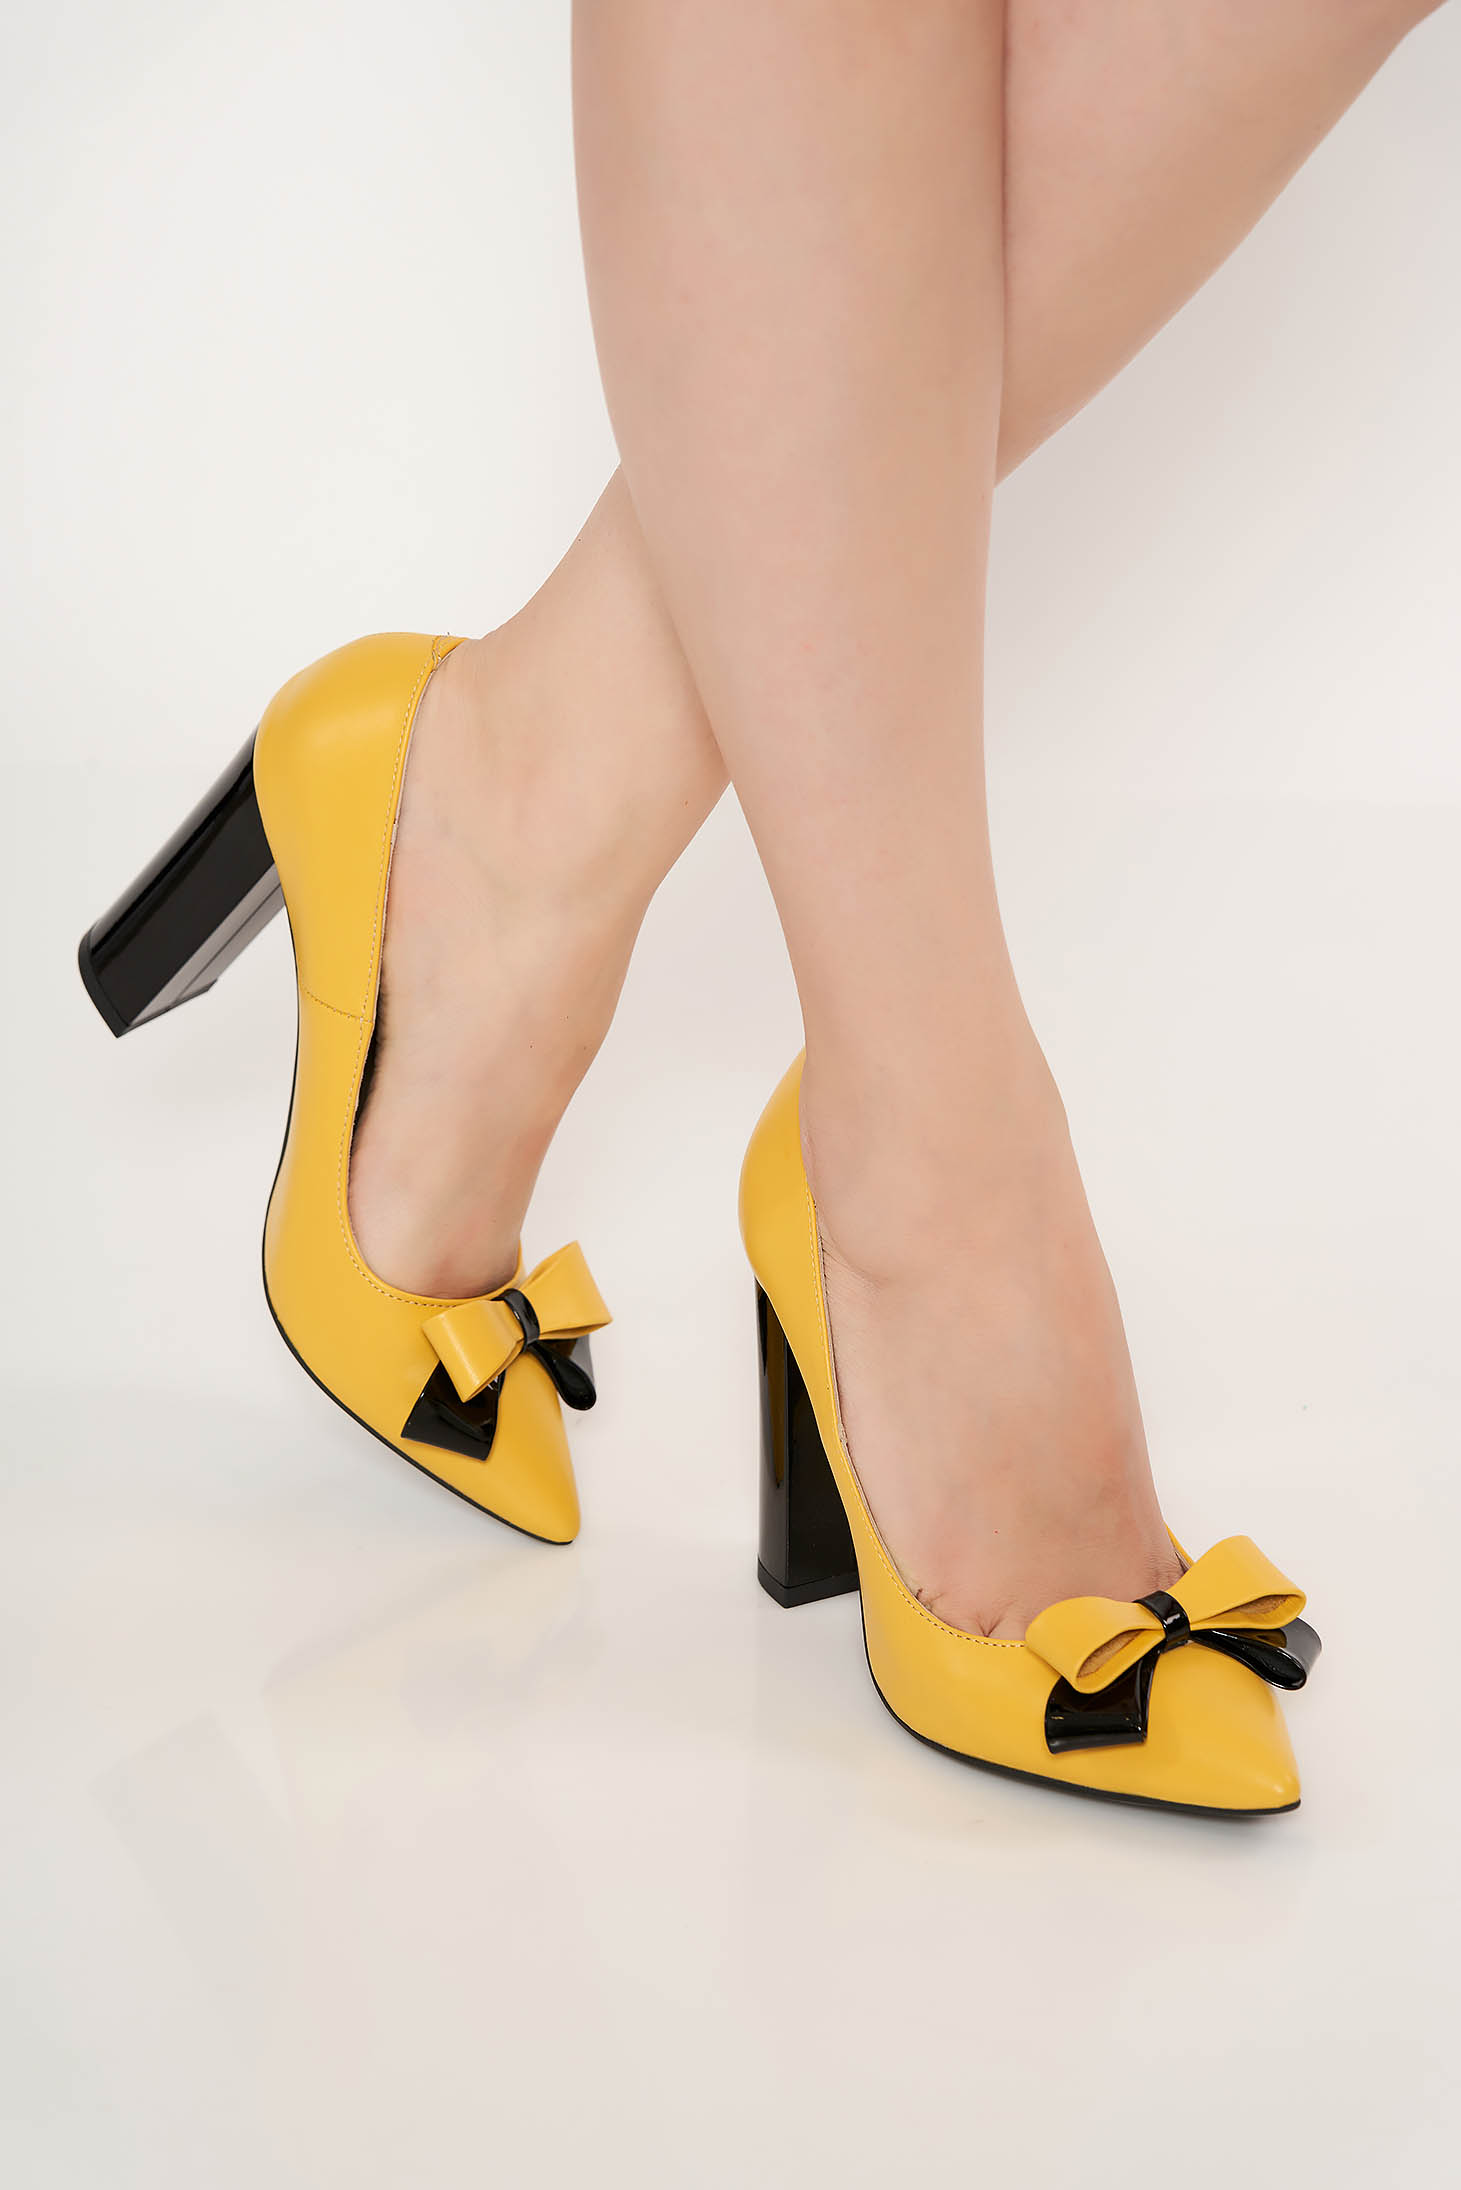 Pantofi galbeni office din piele naturala cu toc gros cu varful usor ascutit accesorizat cu o fundita